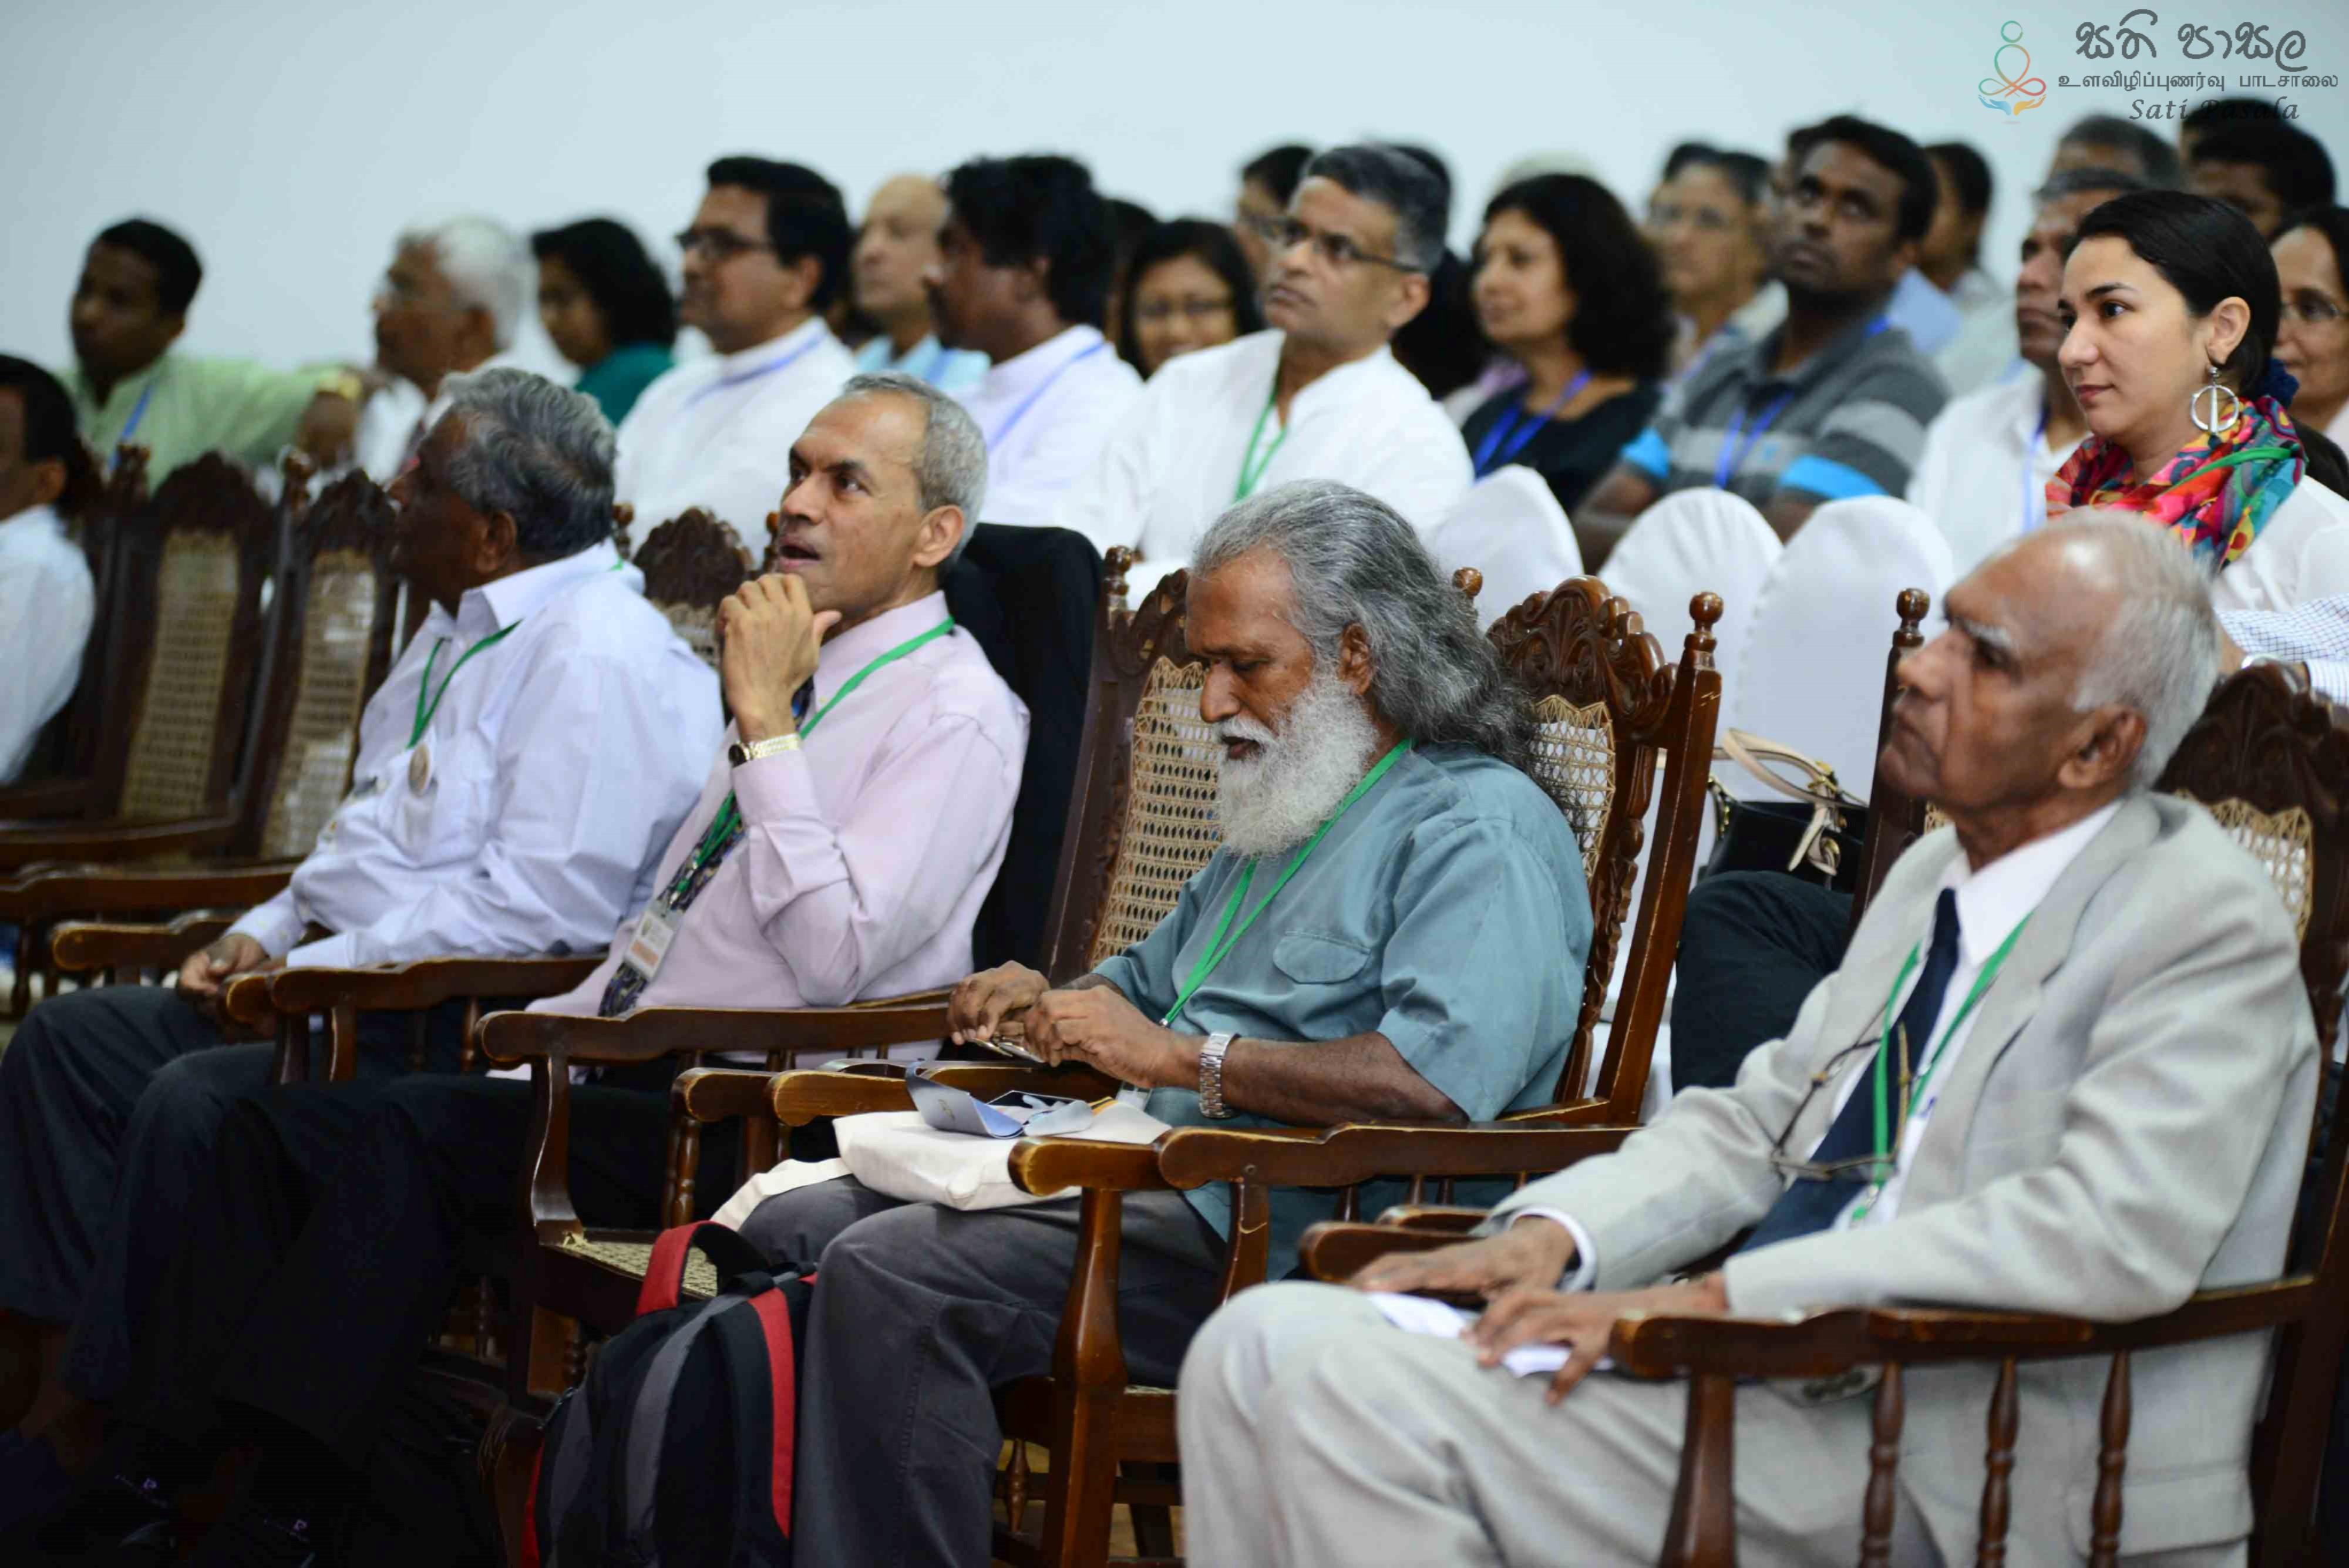 Global Mindfulness Summit 2018 - Day1 (79)